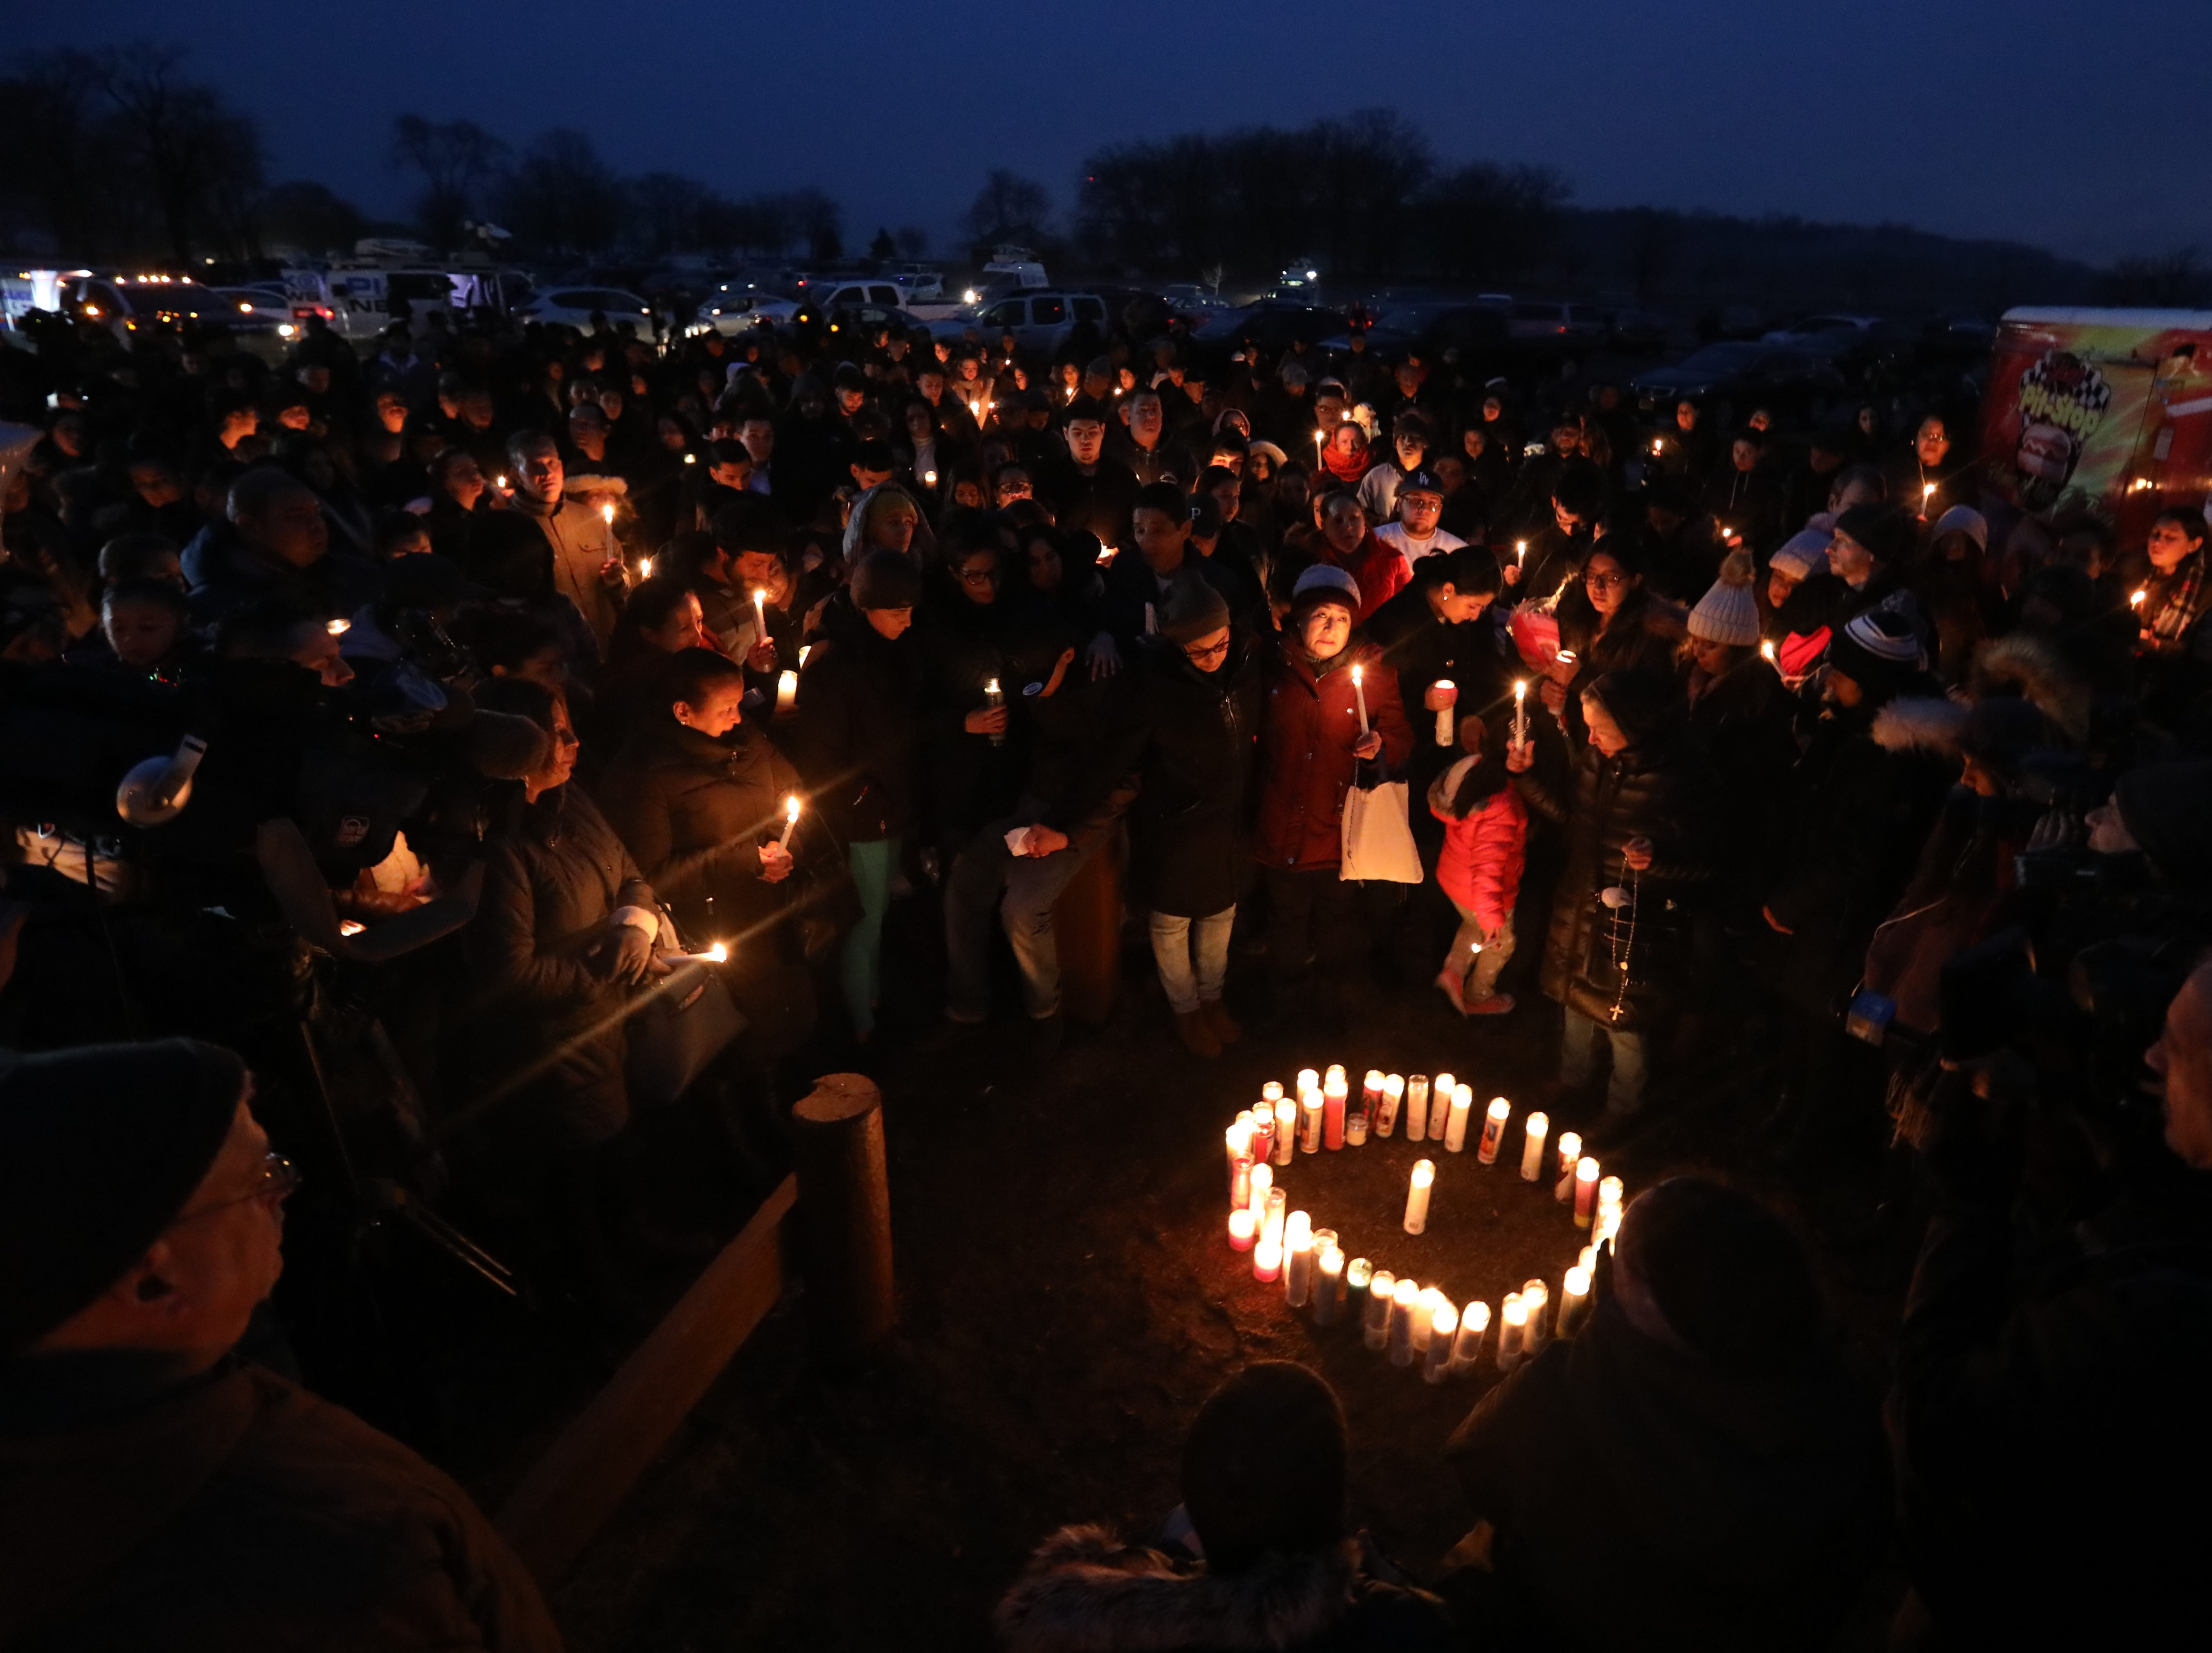 Vigil for Valerie Reyes at Glen Island Park in New Rochelle Feb. 7, 2019. Reyes body was found in Greenwich, Conn. Feb, 5.